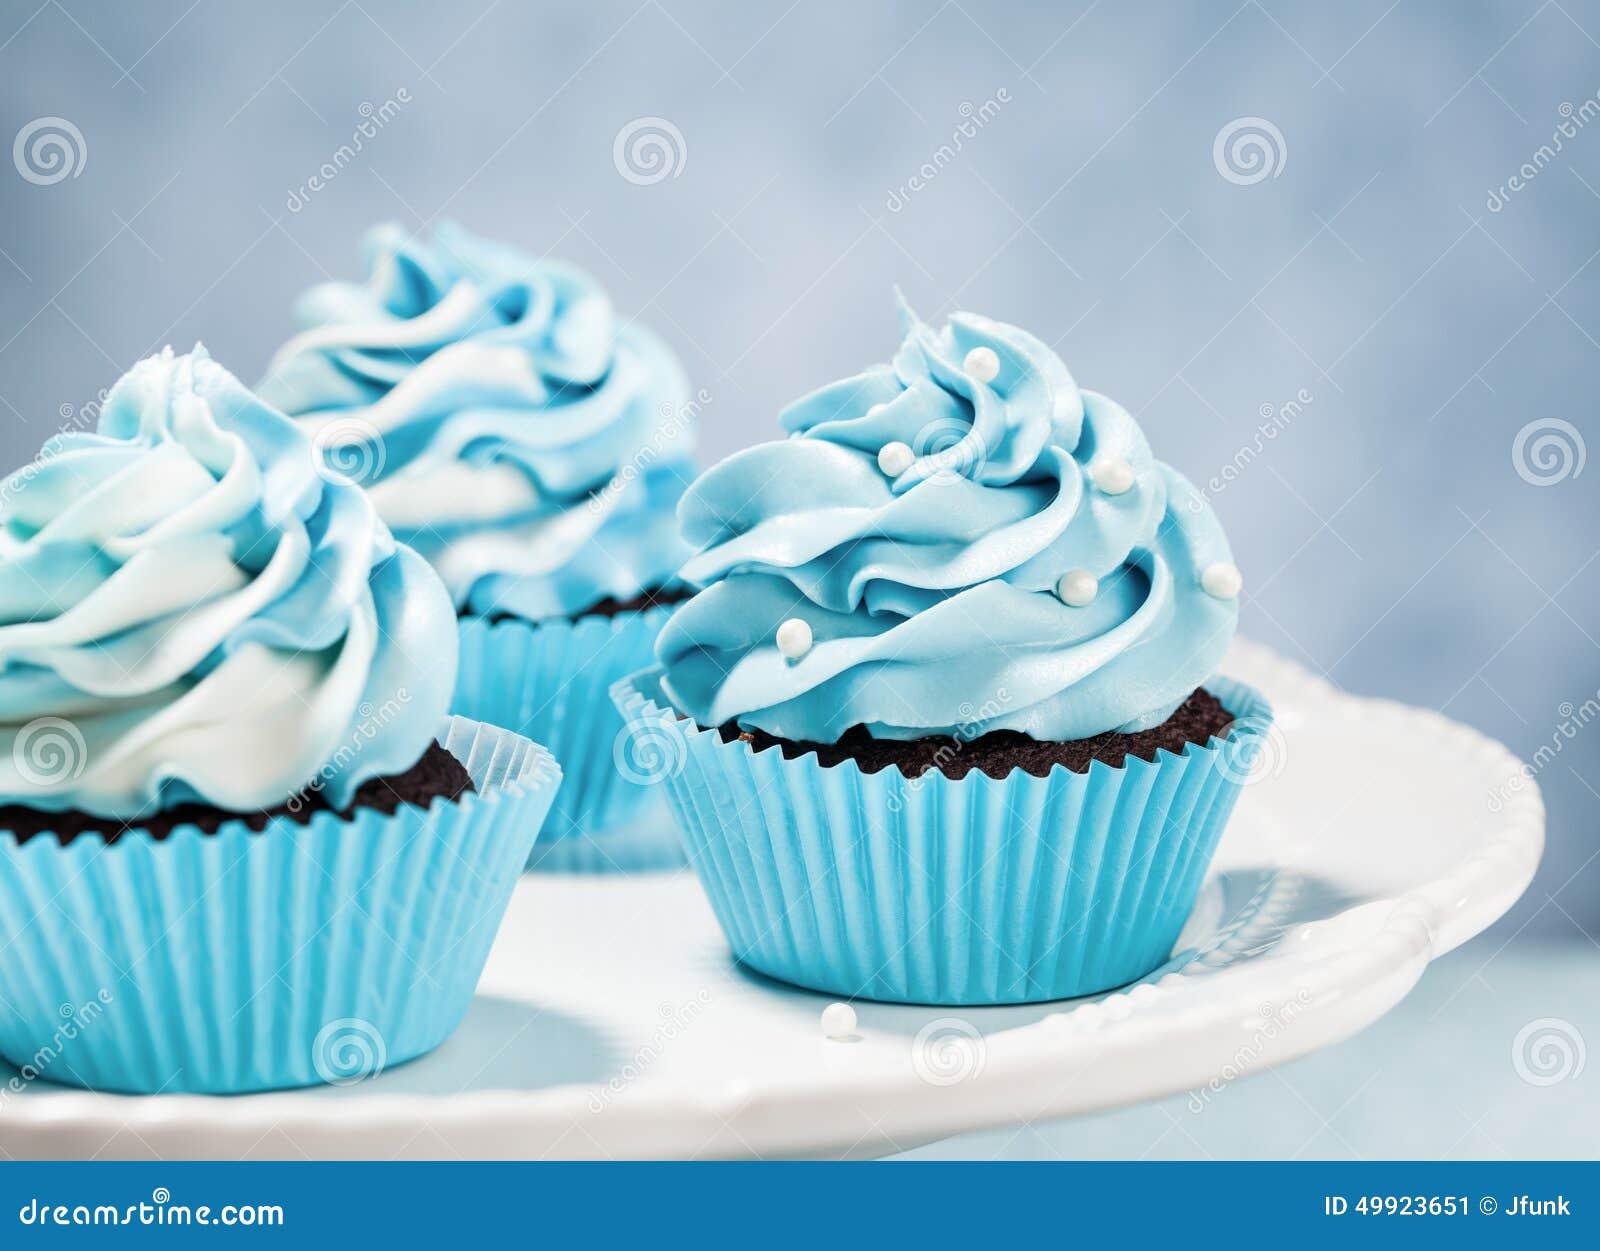 Blue Cupcakes Stock Photo Image 49923651